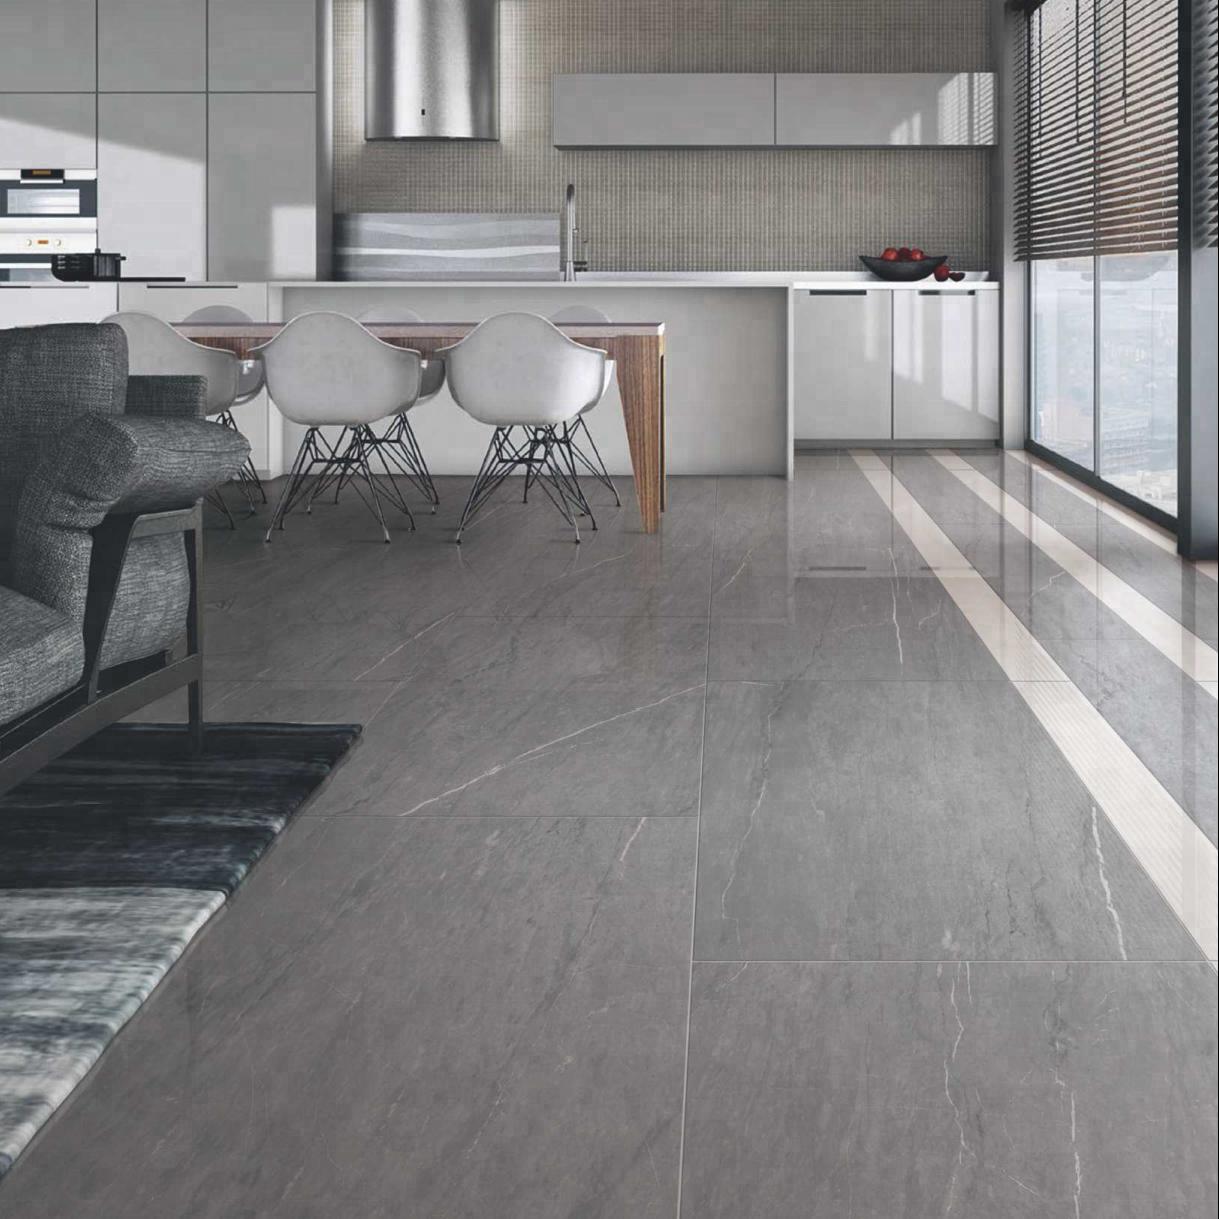 Supply Ash Color Marble Ceramic Floor